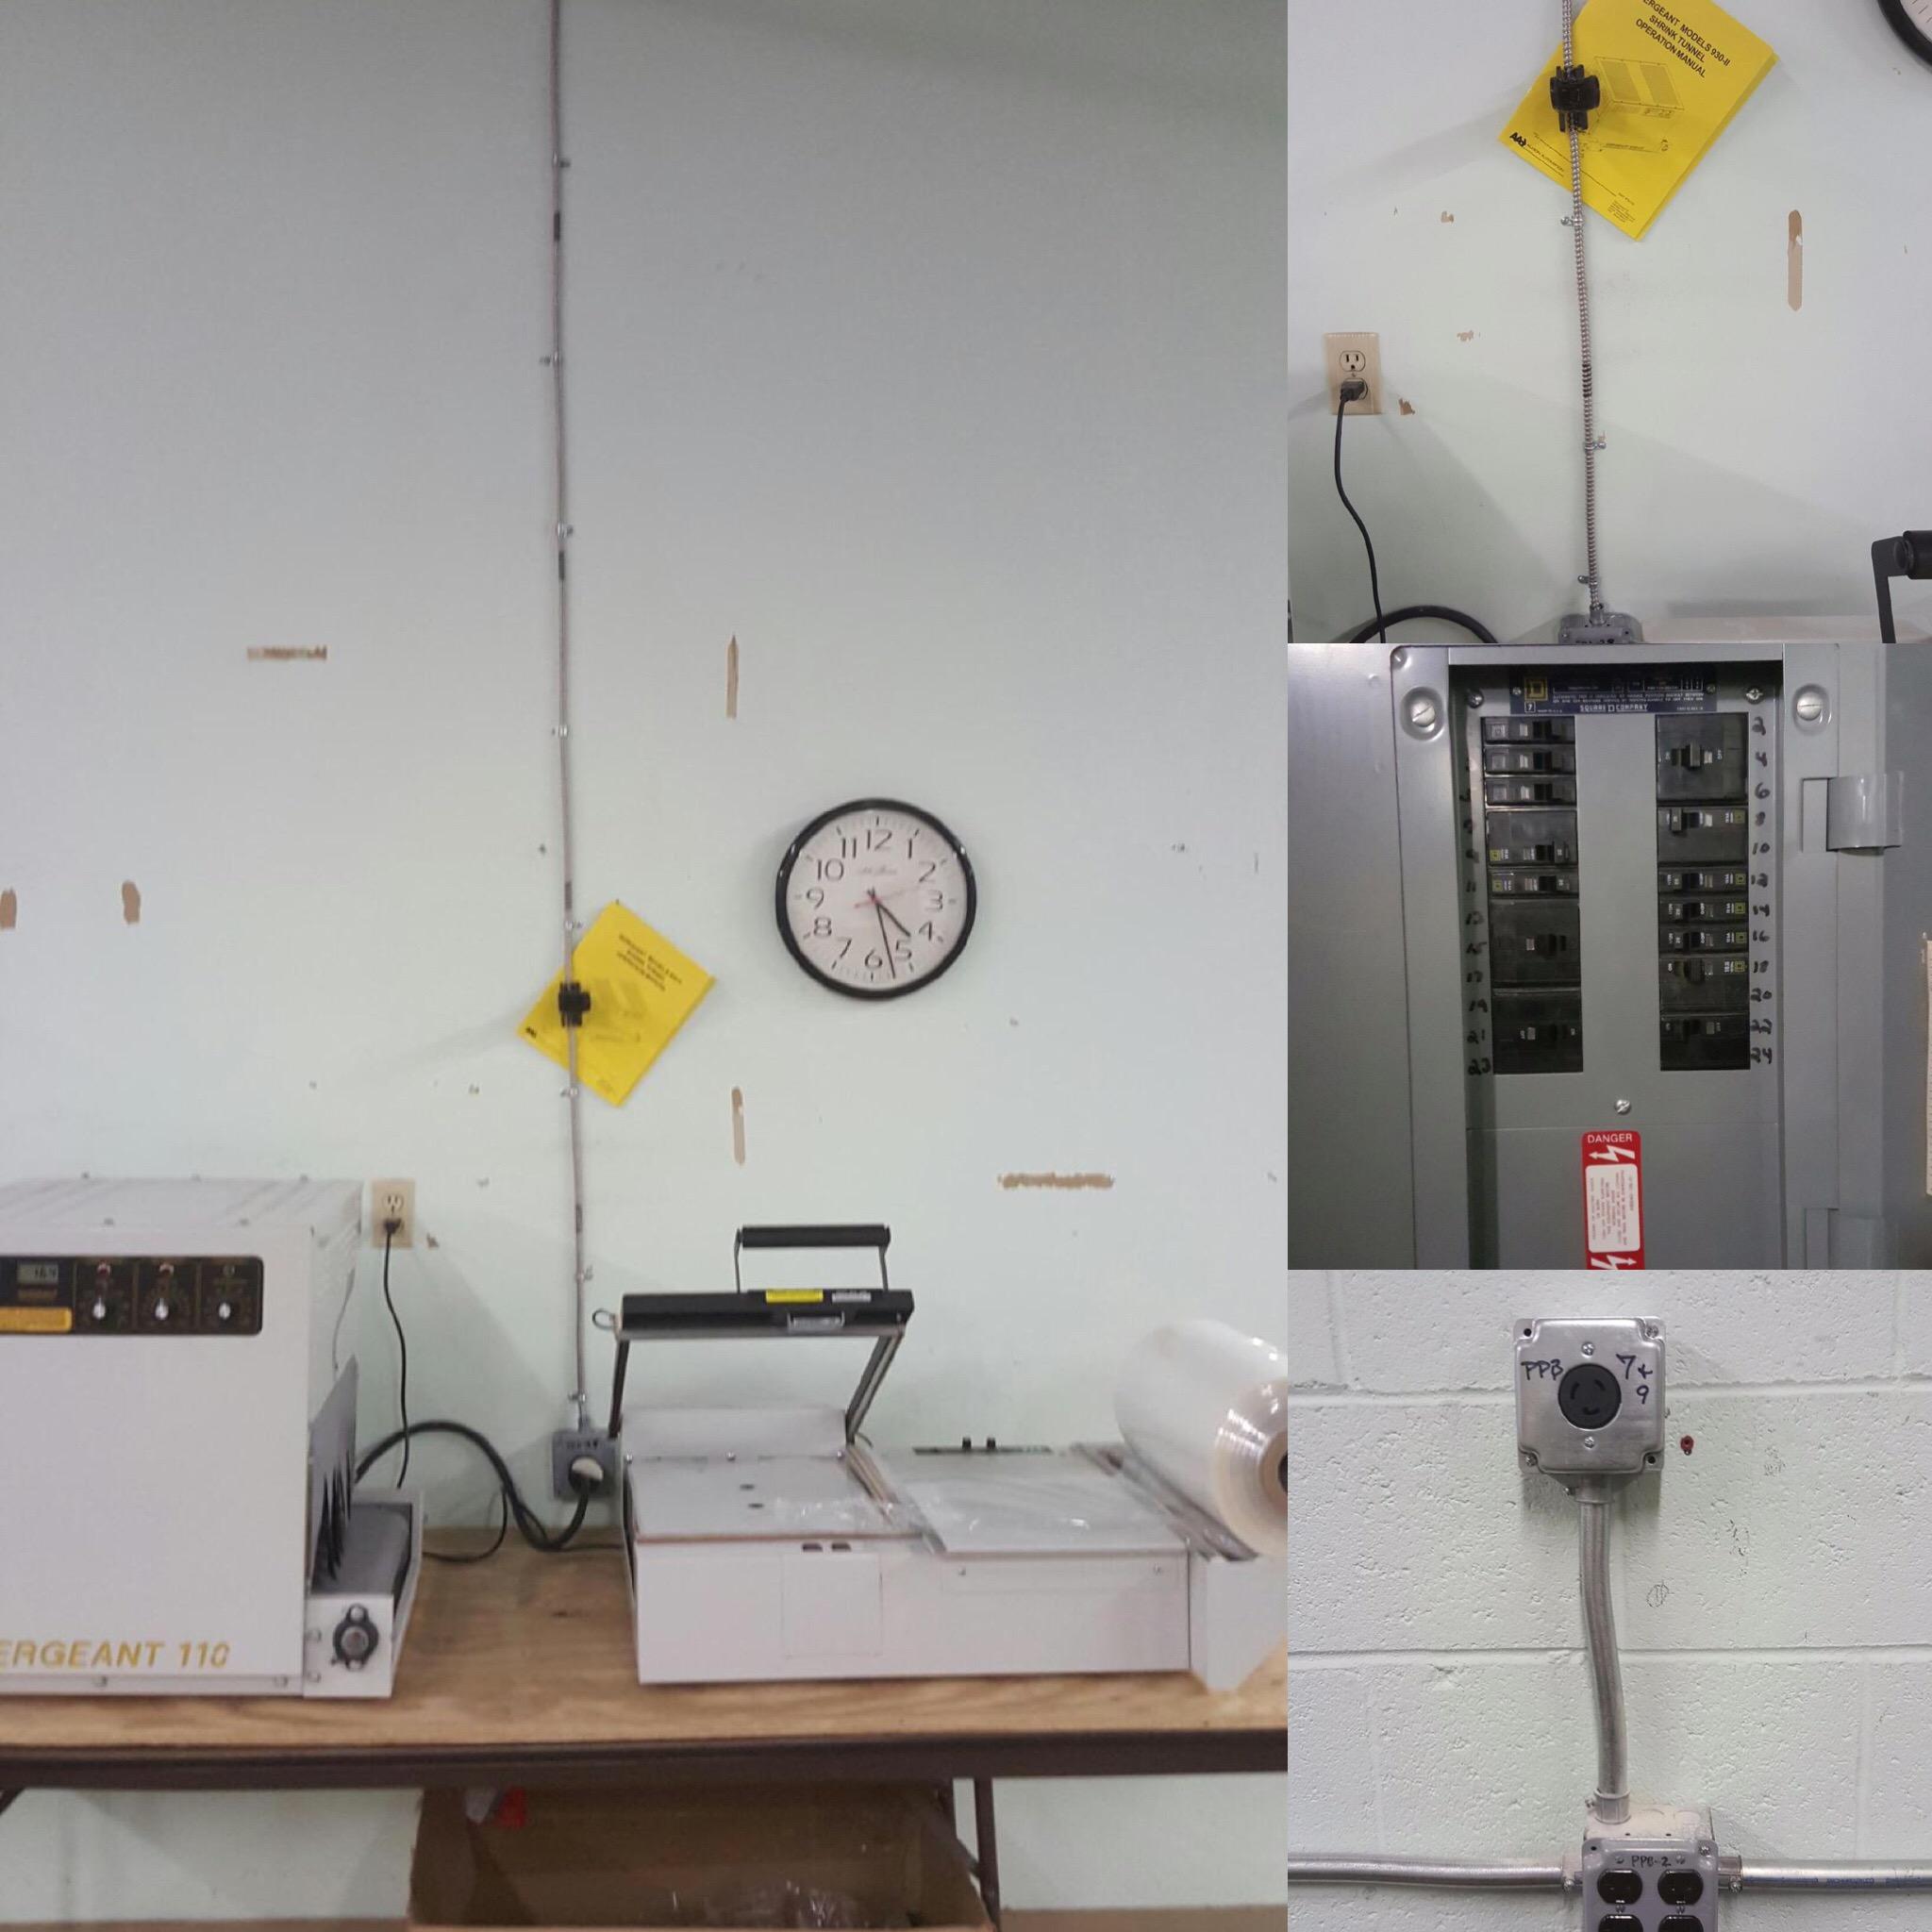 electrical equipment hookup